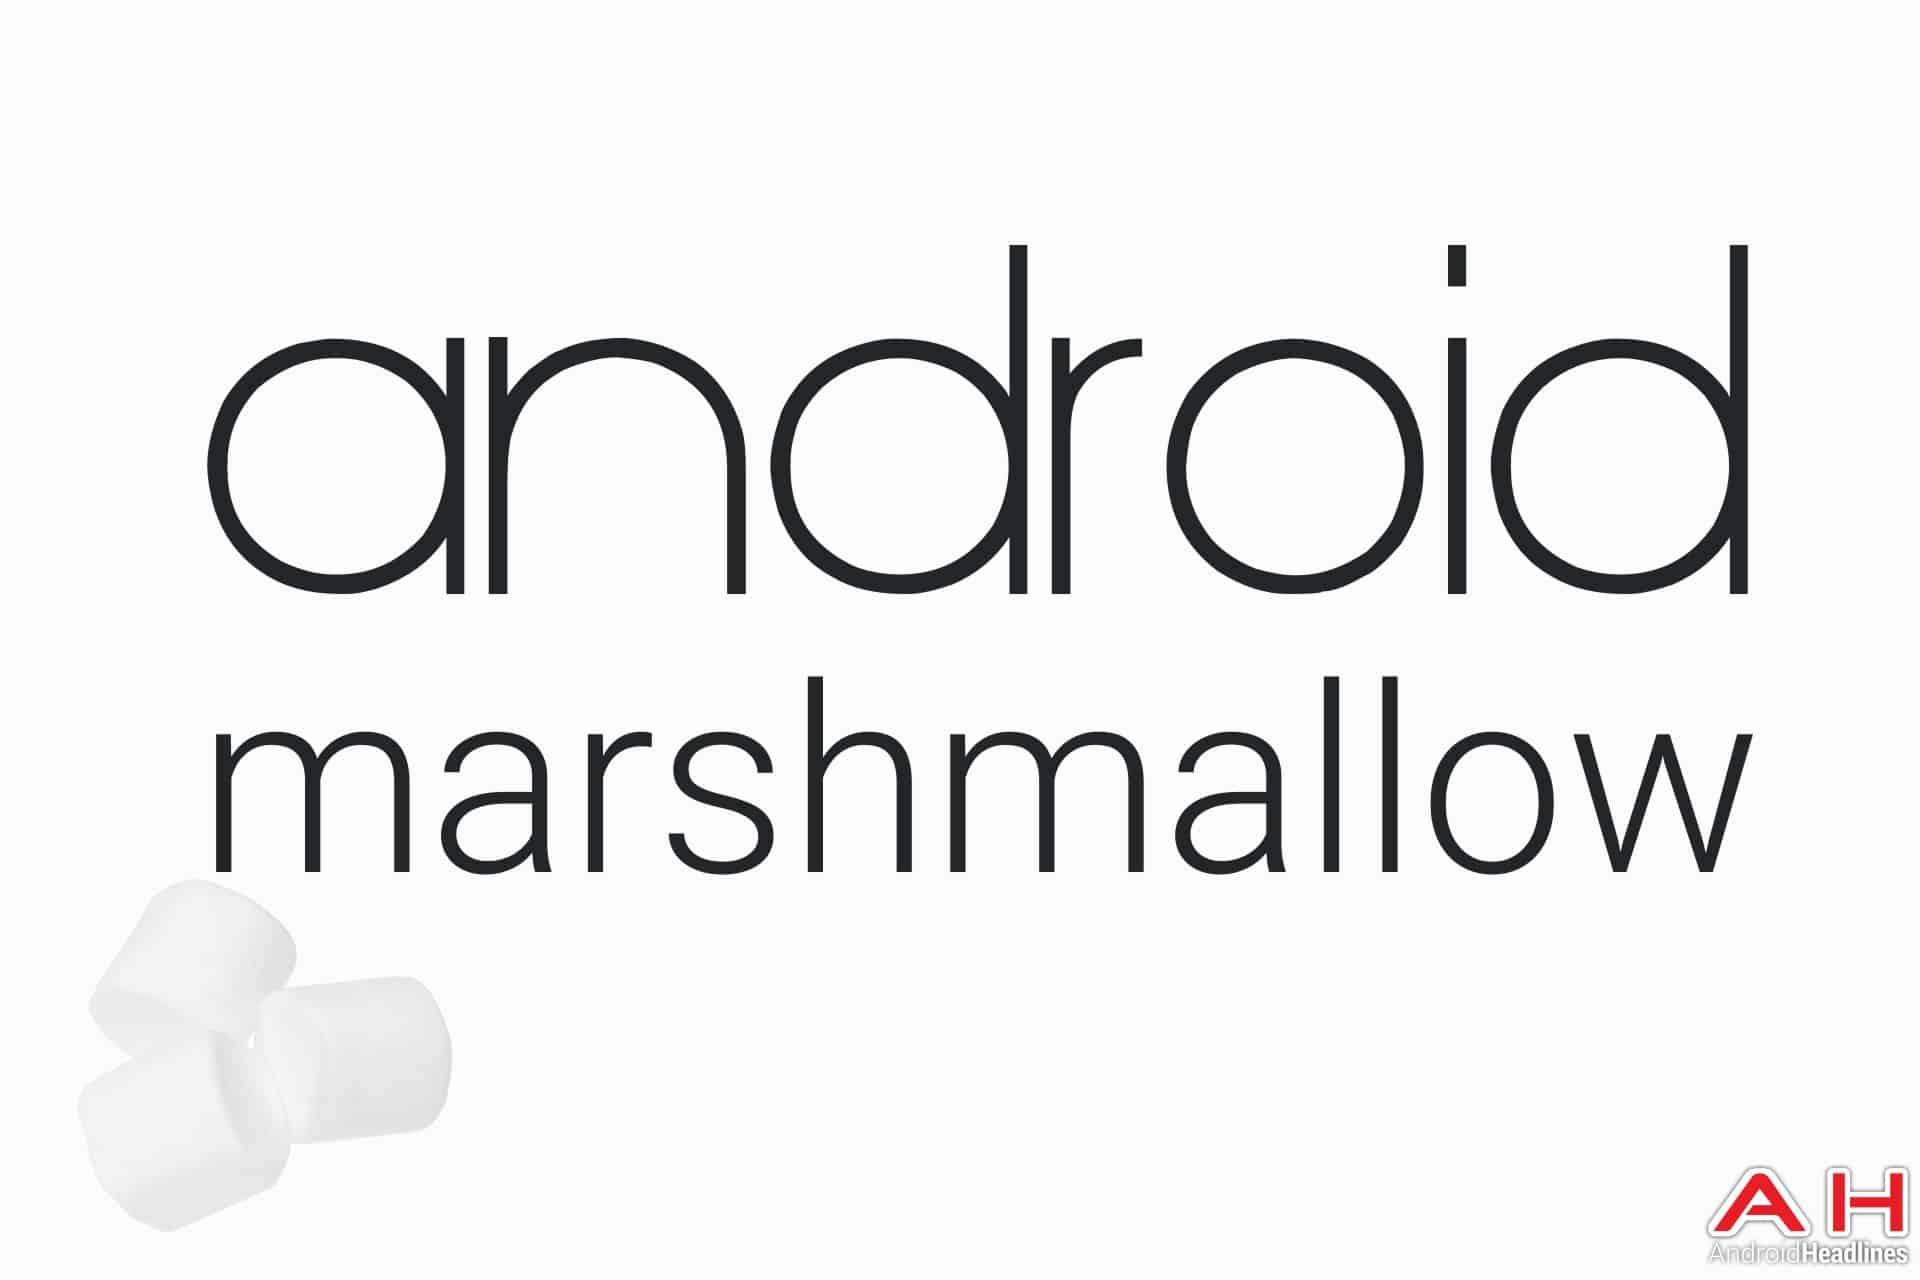 AH Android Marshmallow Logo 1.5